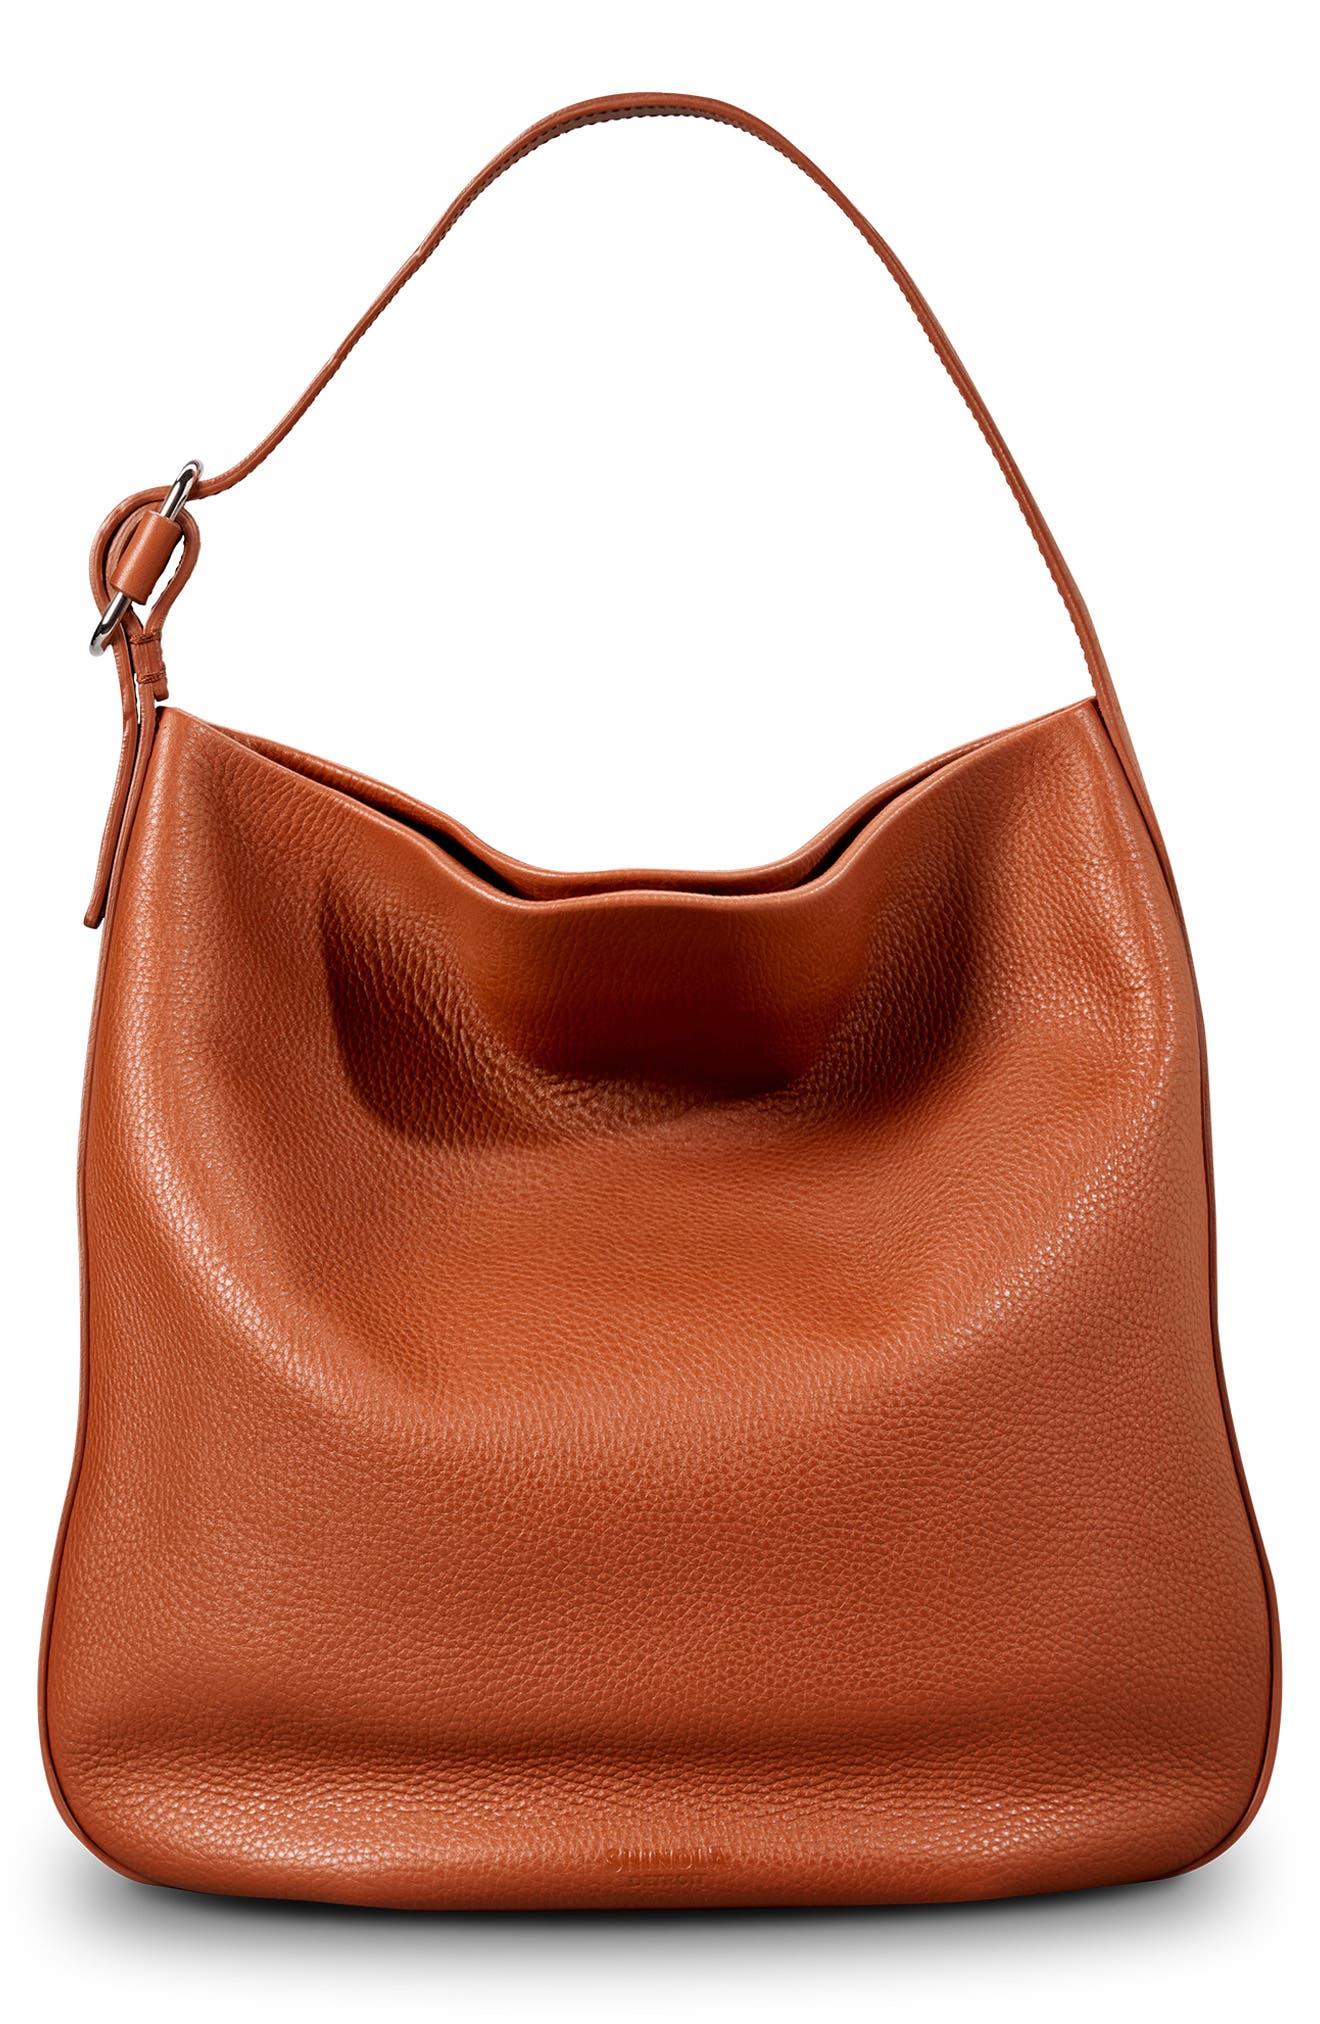 Birdy Grained Leather Hobo Bag,                             Main thumbnail 1, color,                             BOURBON